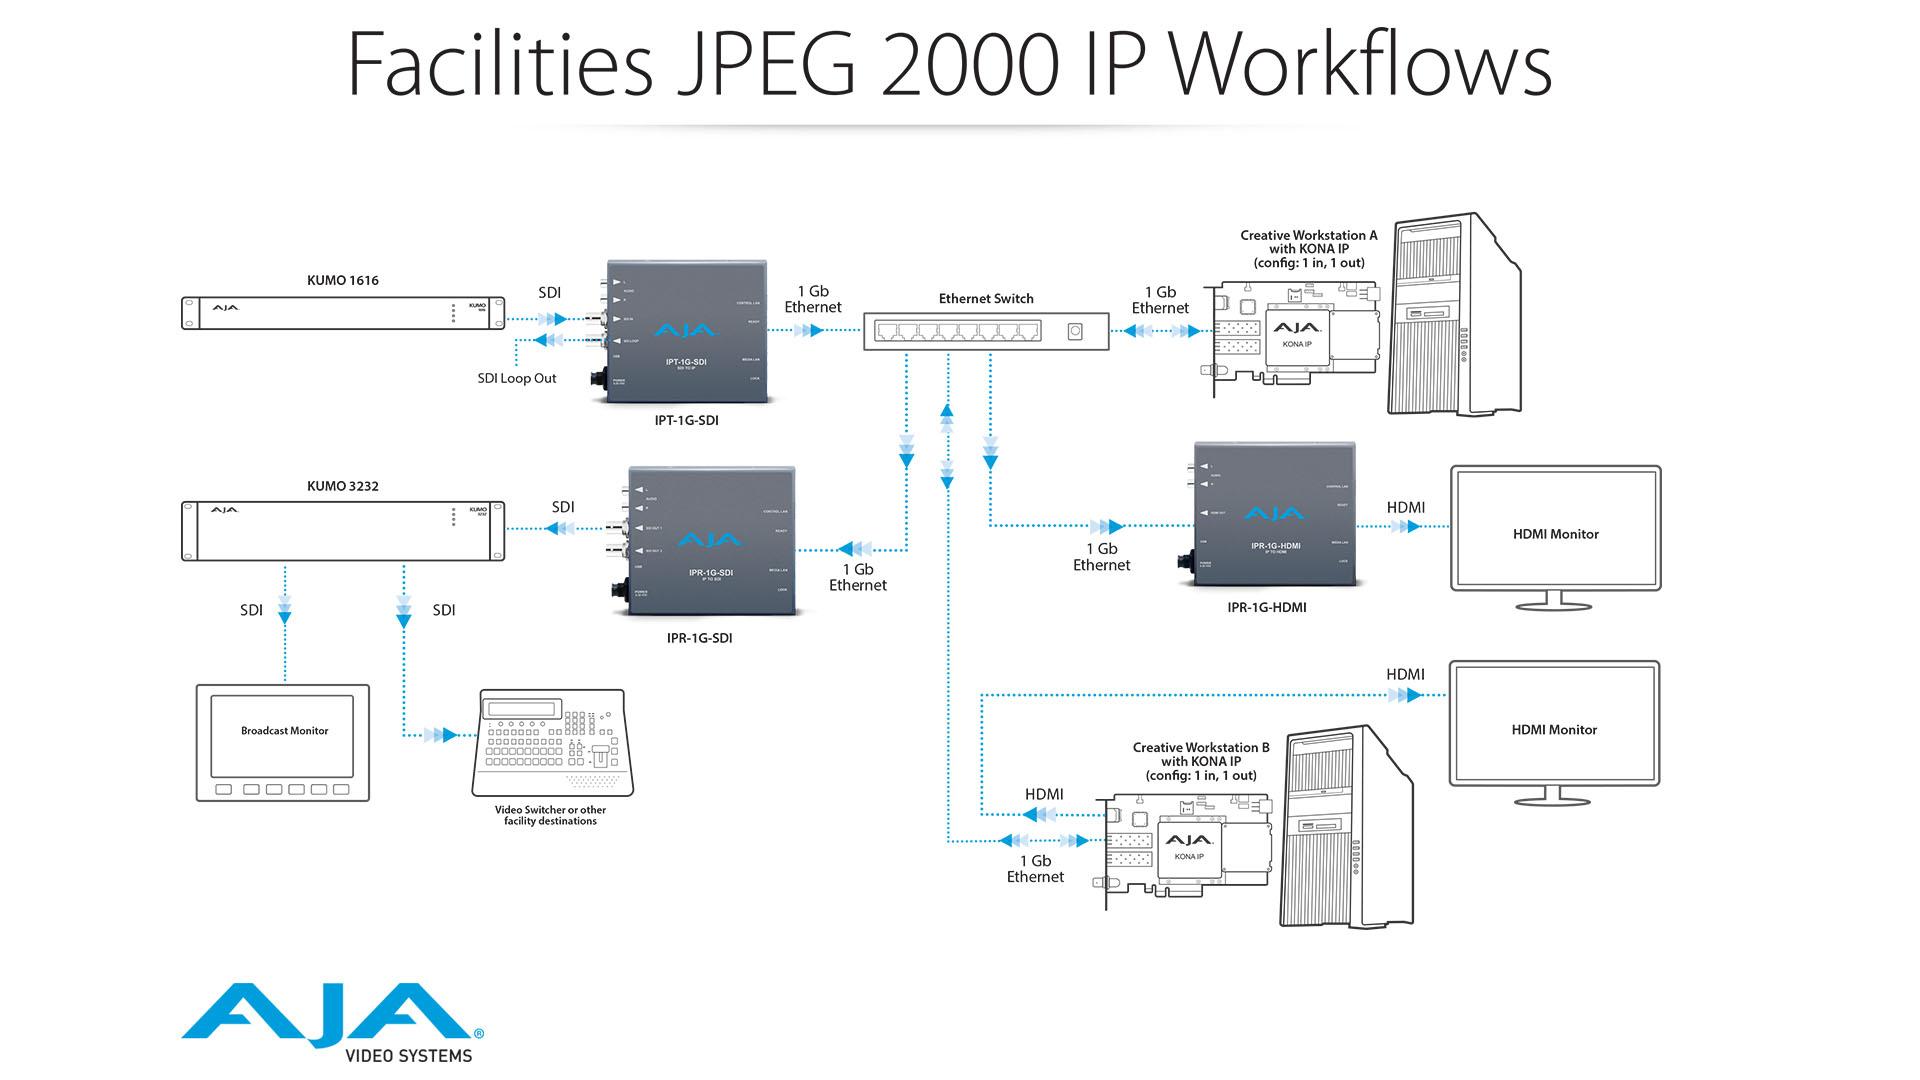 Ipt 1g Sdi 3g Video And Audio To Jpeg 2000 Converter Mini Hdmi Matrix Wiring Diagram View Workflow